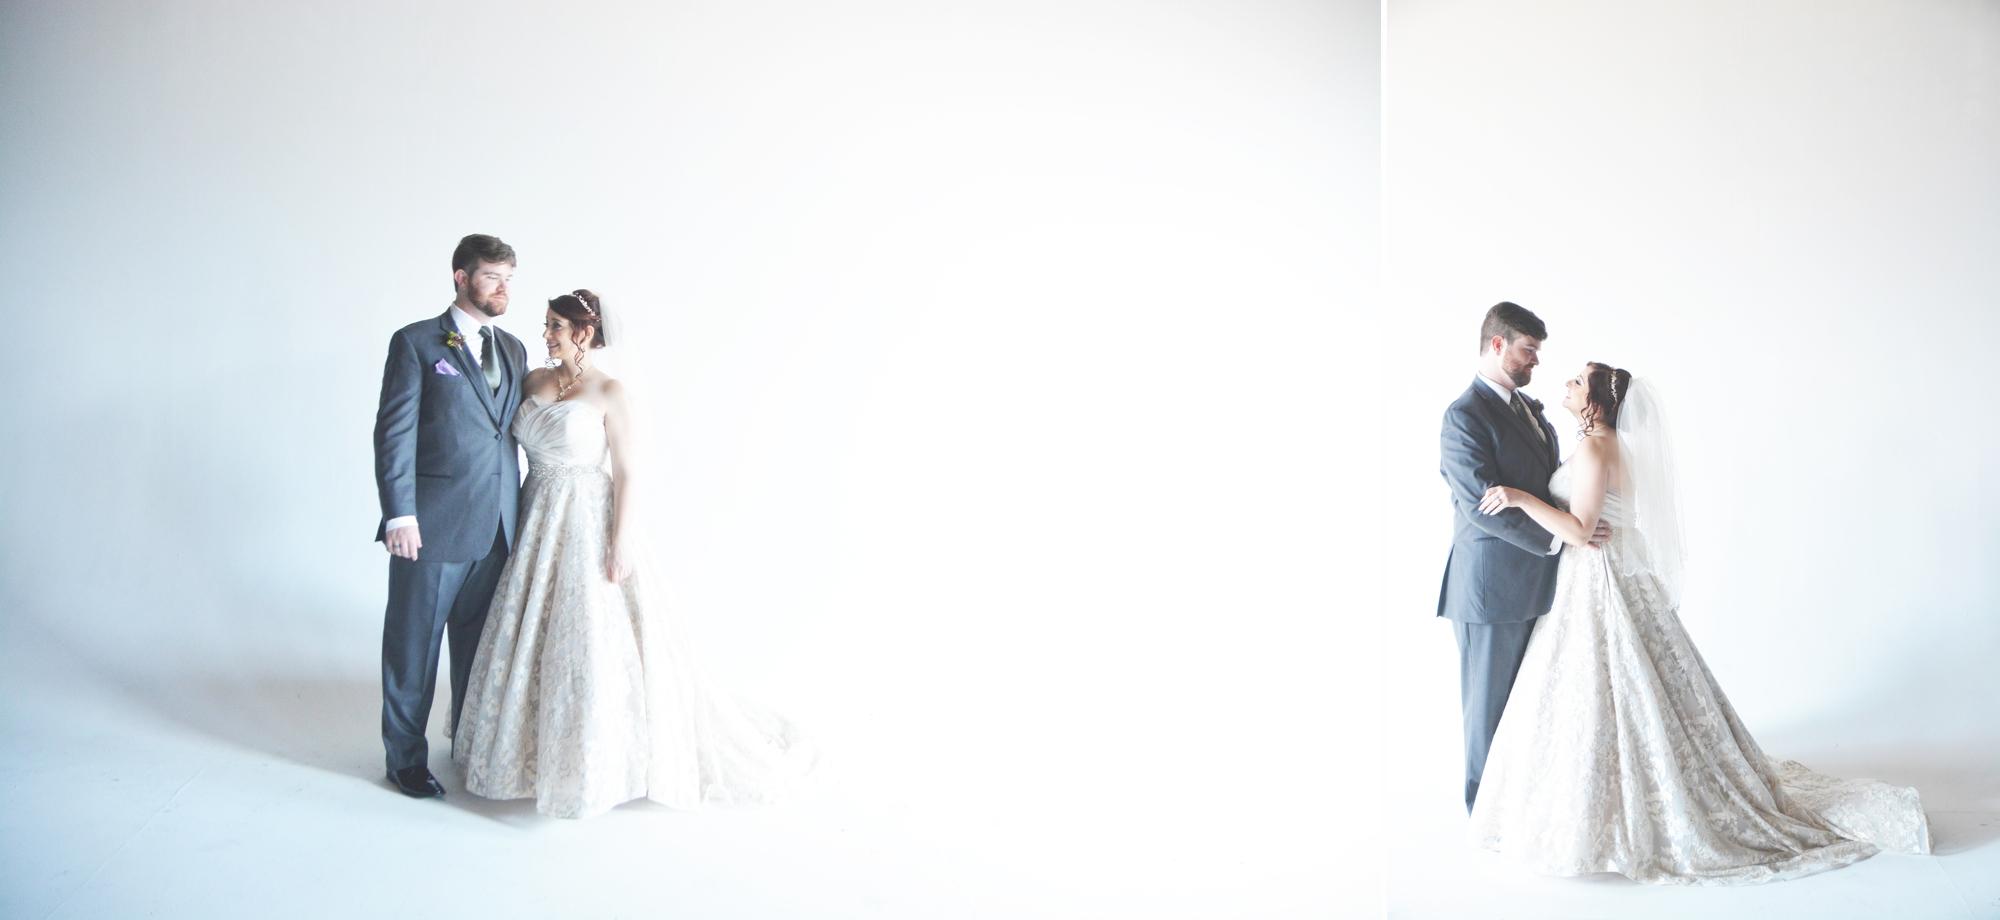 ambient-studio-wedding-photography-six-hearts-photography026